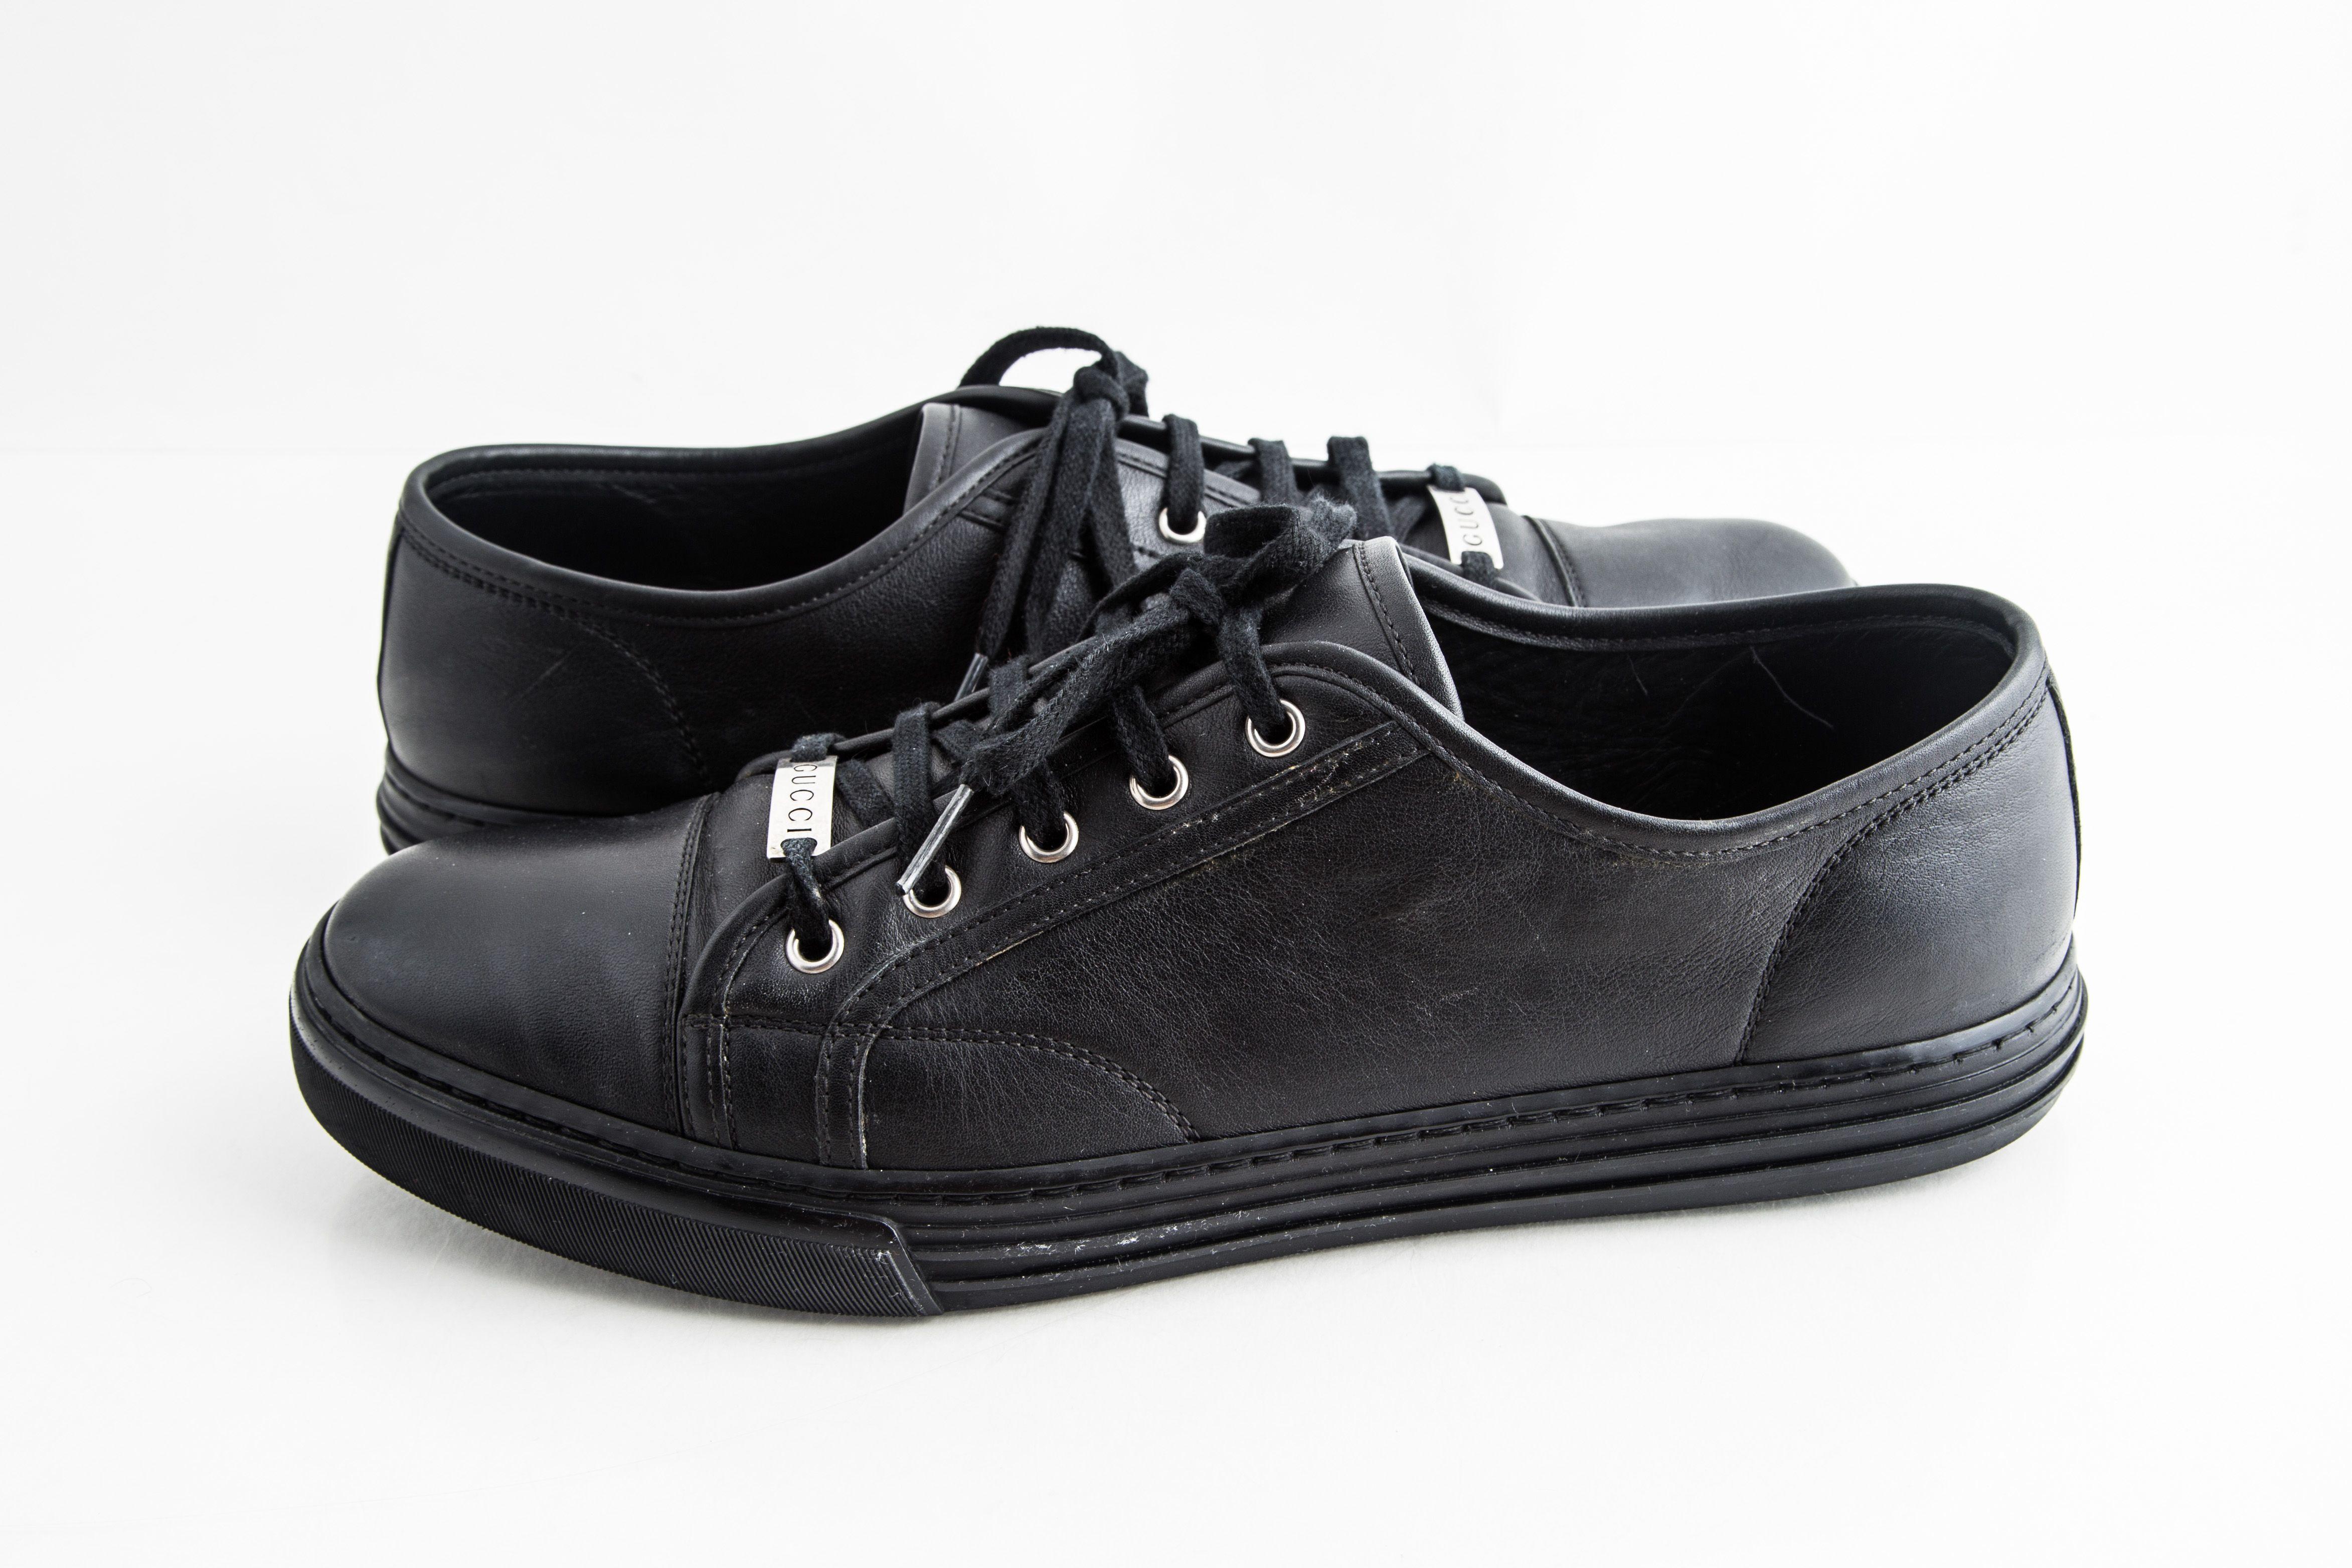 Gucci Miro Soft Nero Low Top Sneakers